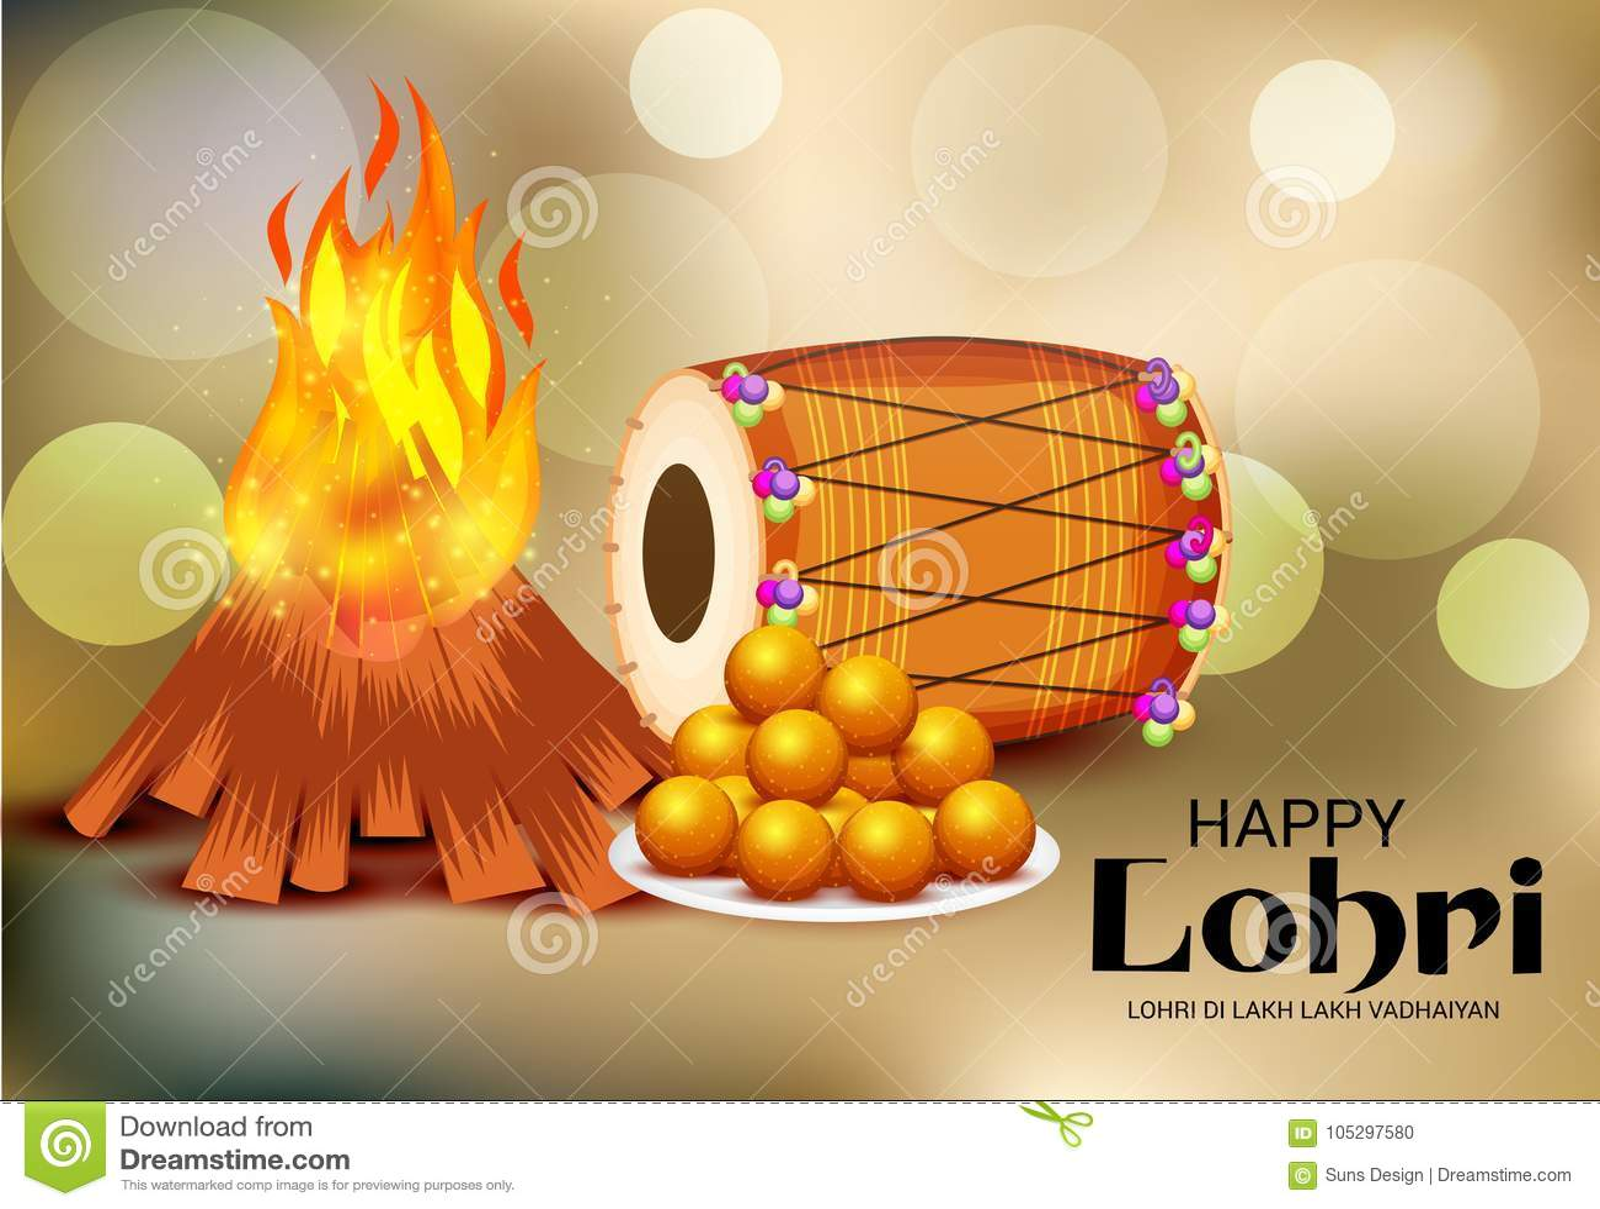 Happy lohri festival celebration stock illustration illustration download happy lohri festival celebration stock illustration illustration of greeting harvest 105297580 m4hsunfo